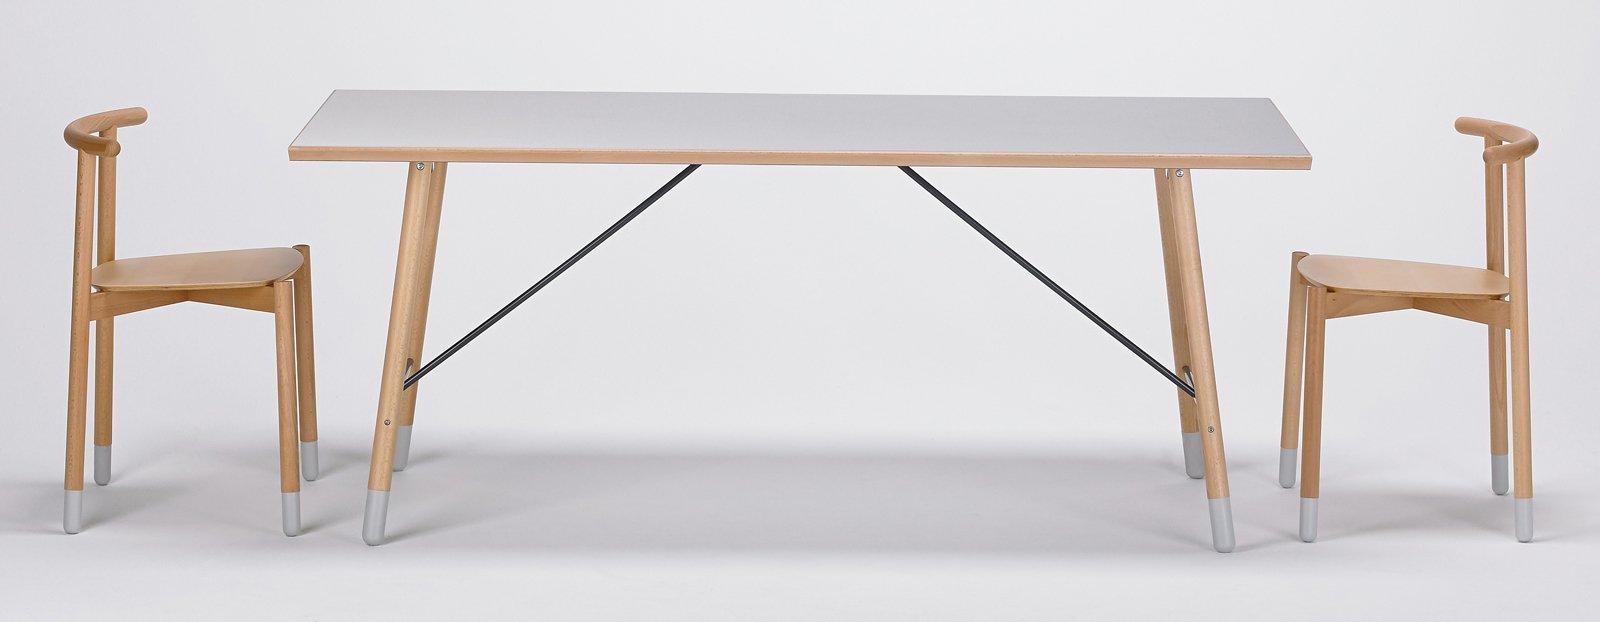 Design tavoli mini maxi cose di casa - Gambe per tavoli ikea ...